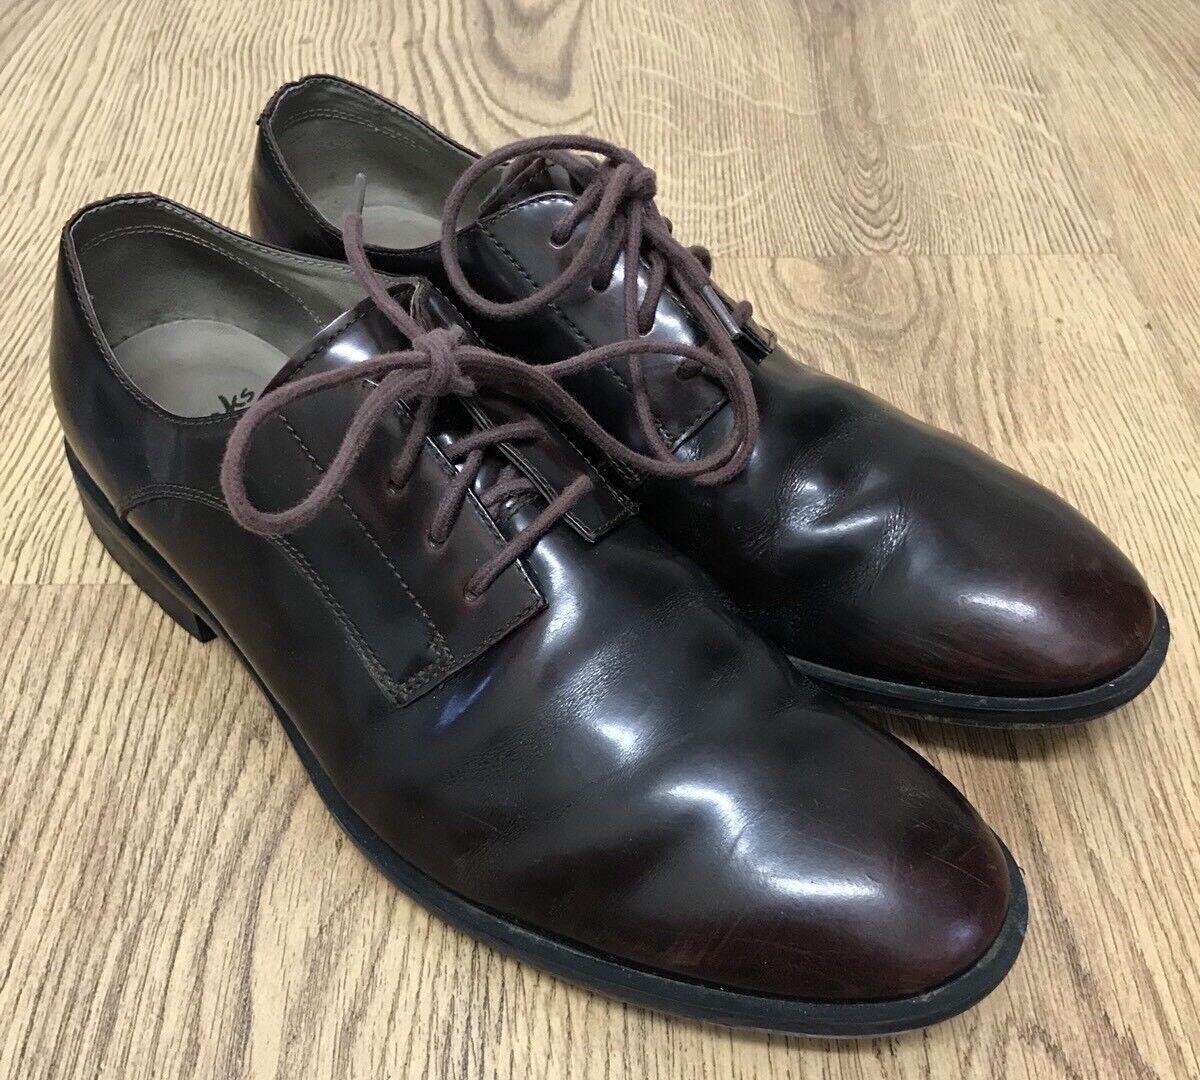 Clarks Mens TOR England Oxblood  Burgundy Smart shoes Size 8UK Lace Up